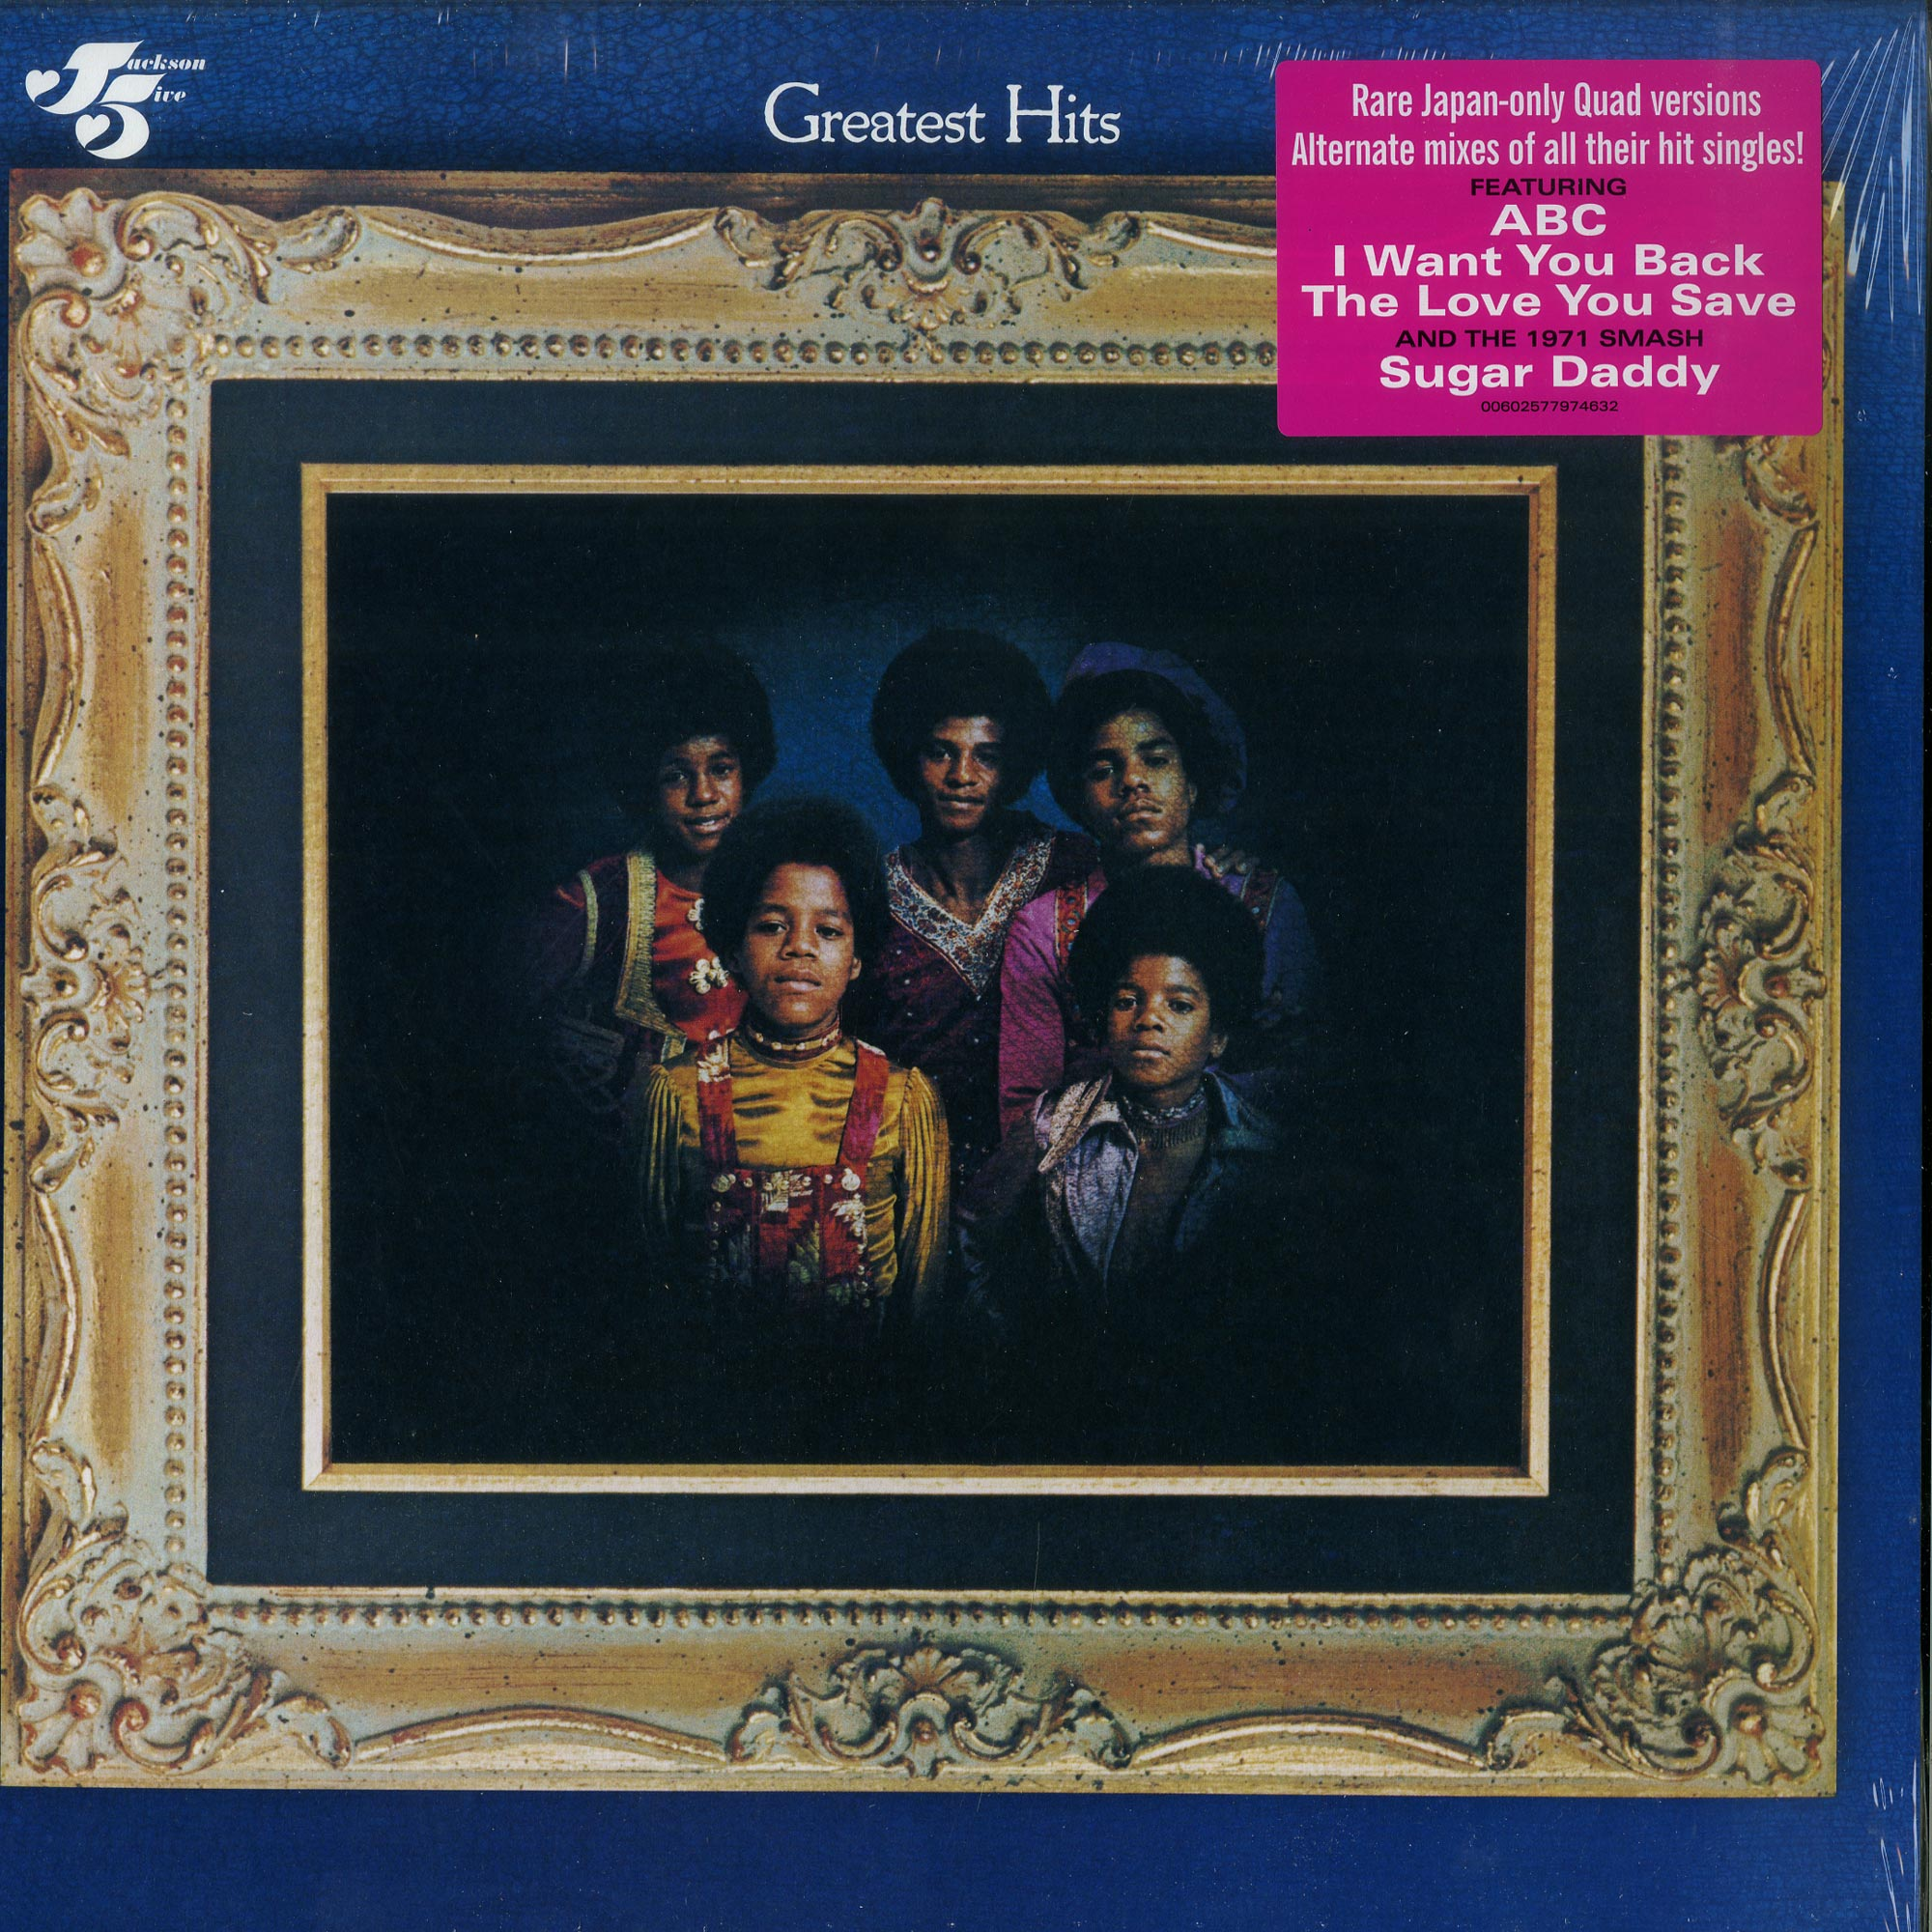 Jackson 5 - GREATEST HITS - QUADRAPHONIC MIX